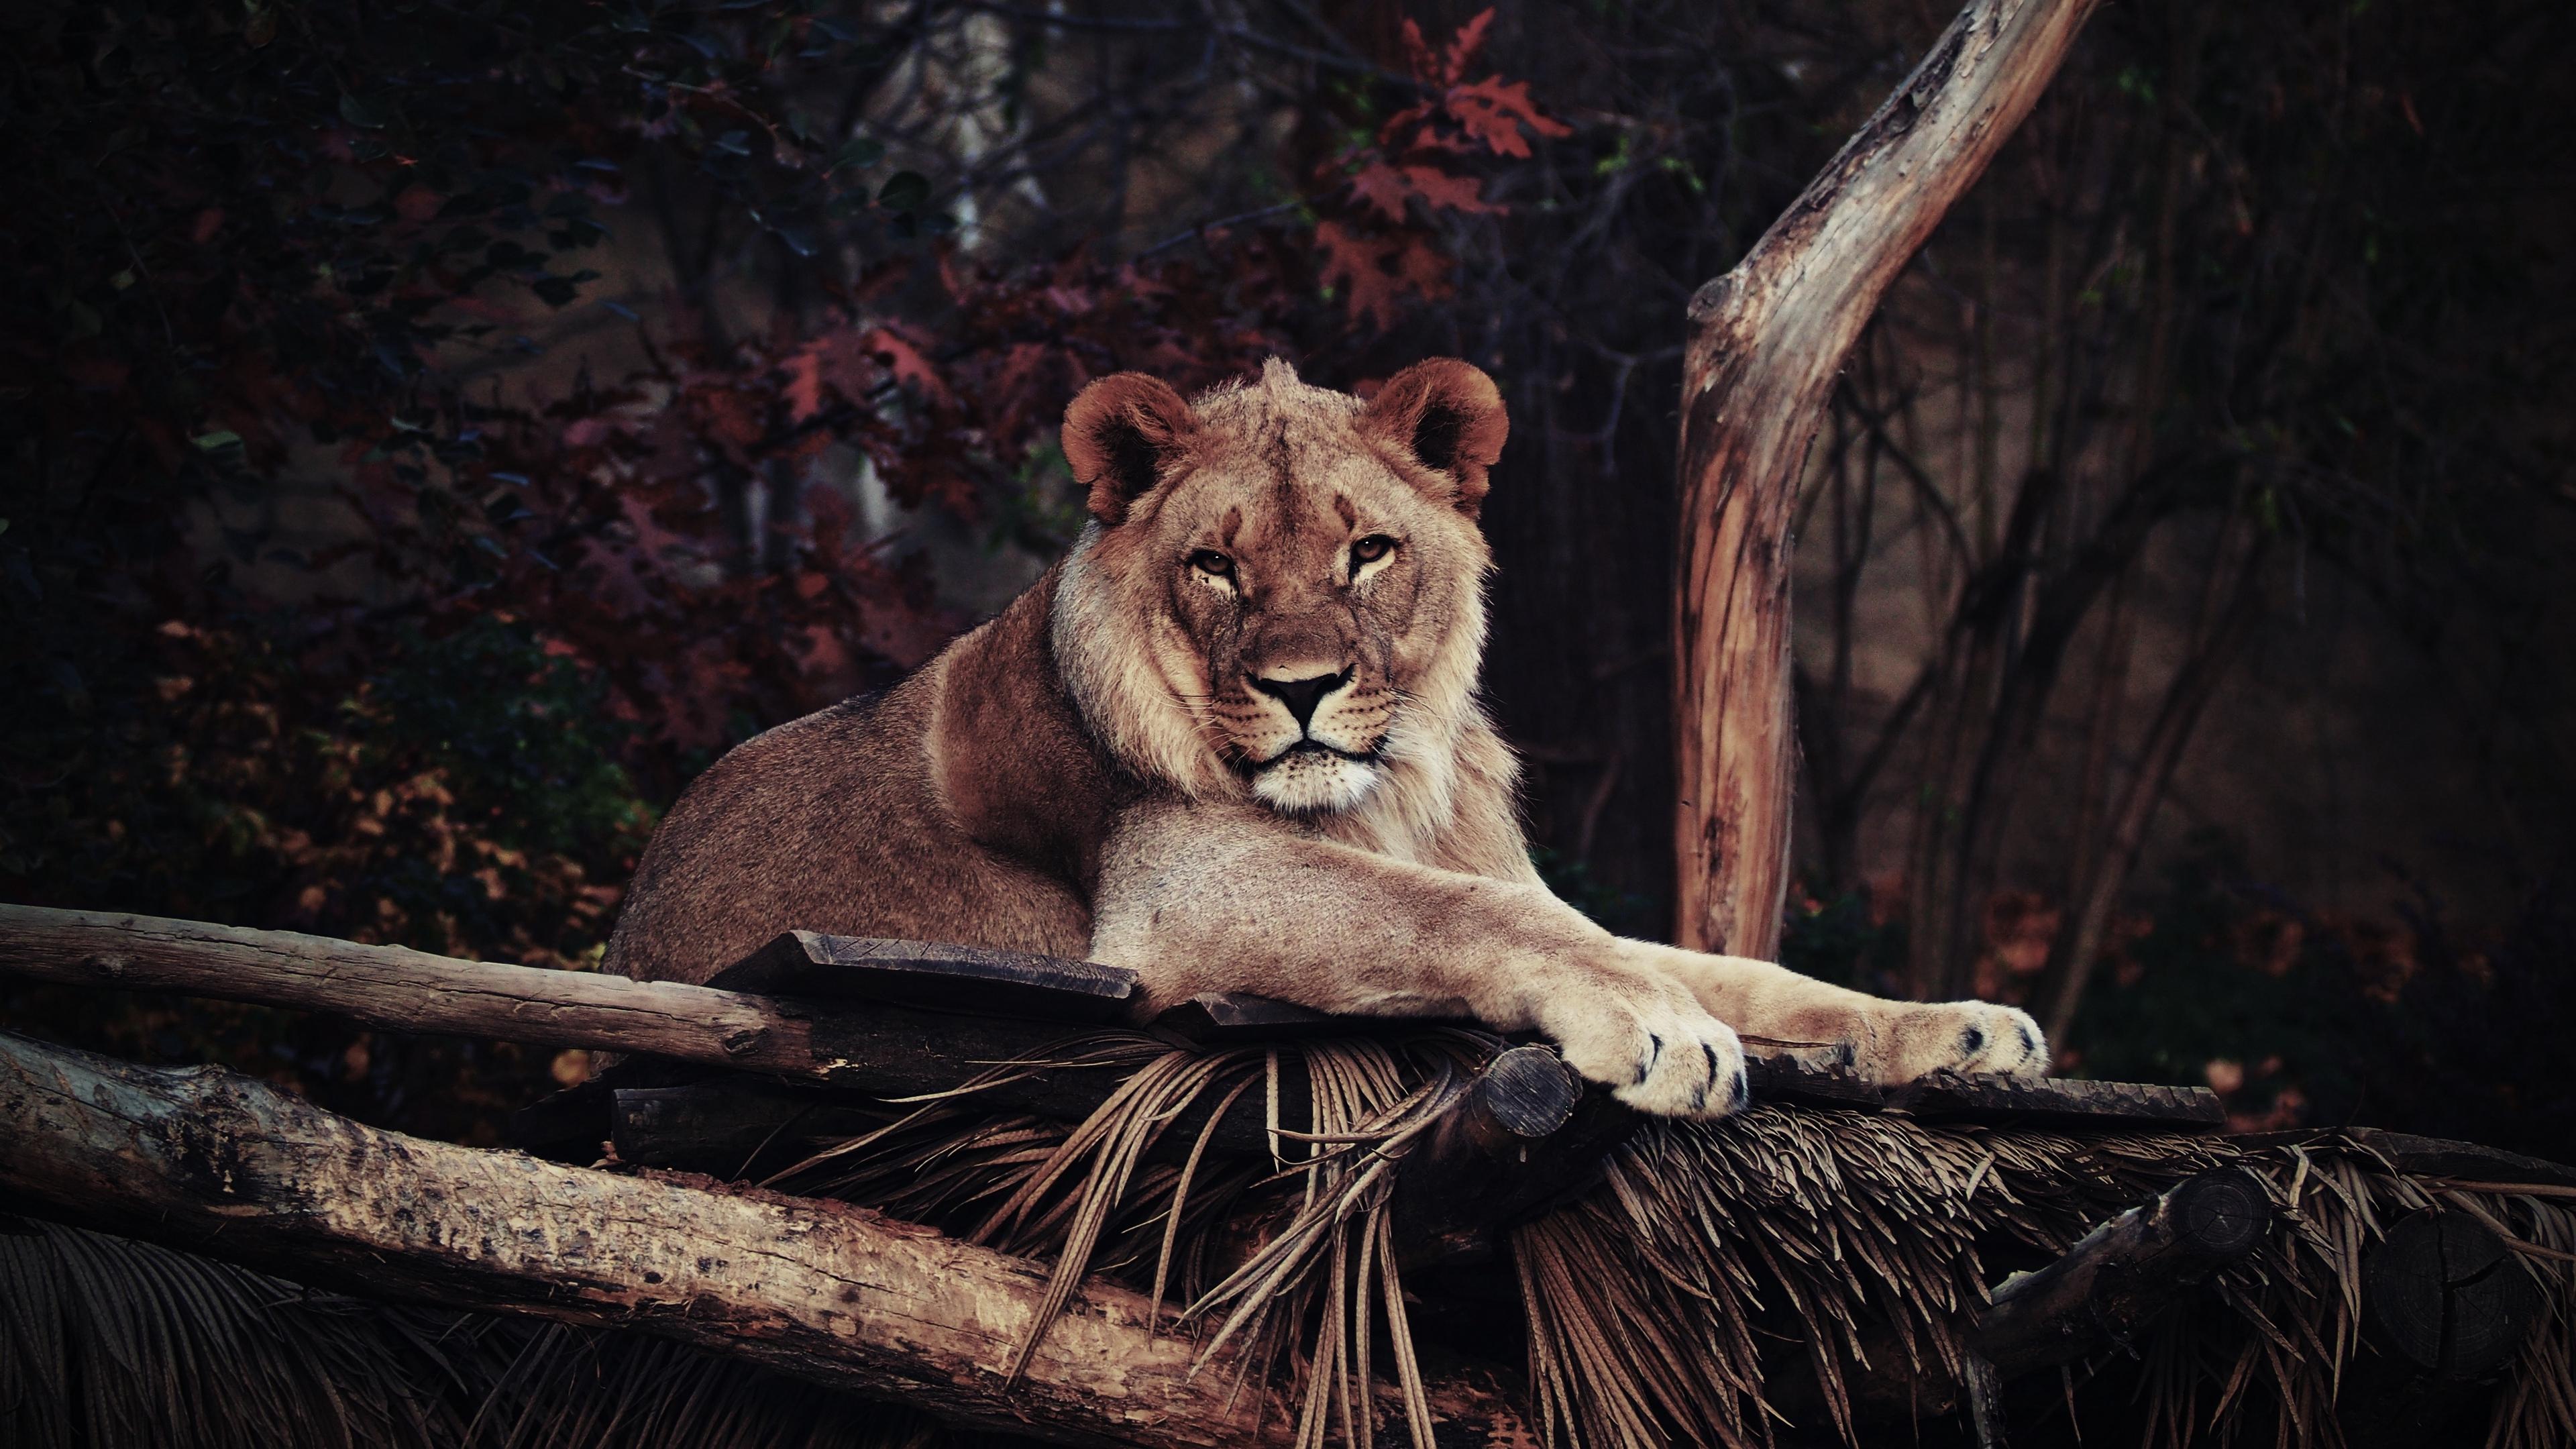 lion predator lying king of beasts 4k 1542241960 - lion, predator, lying, king of beasts 4k - Predator, Lying, Lion